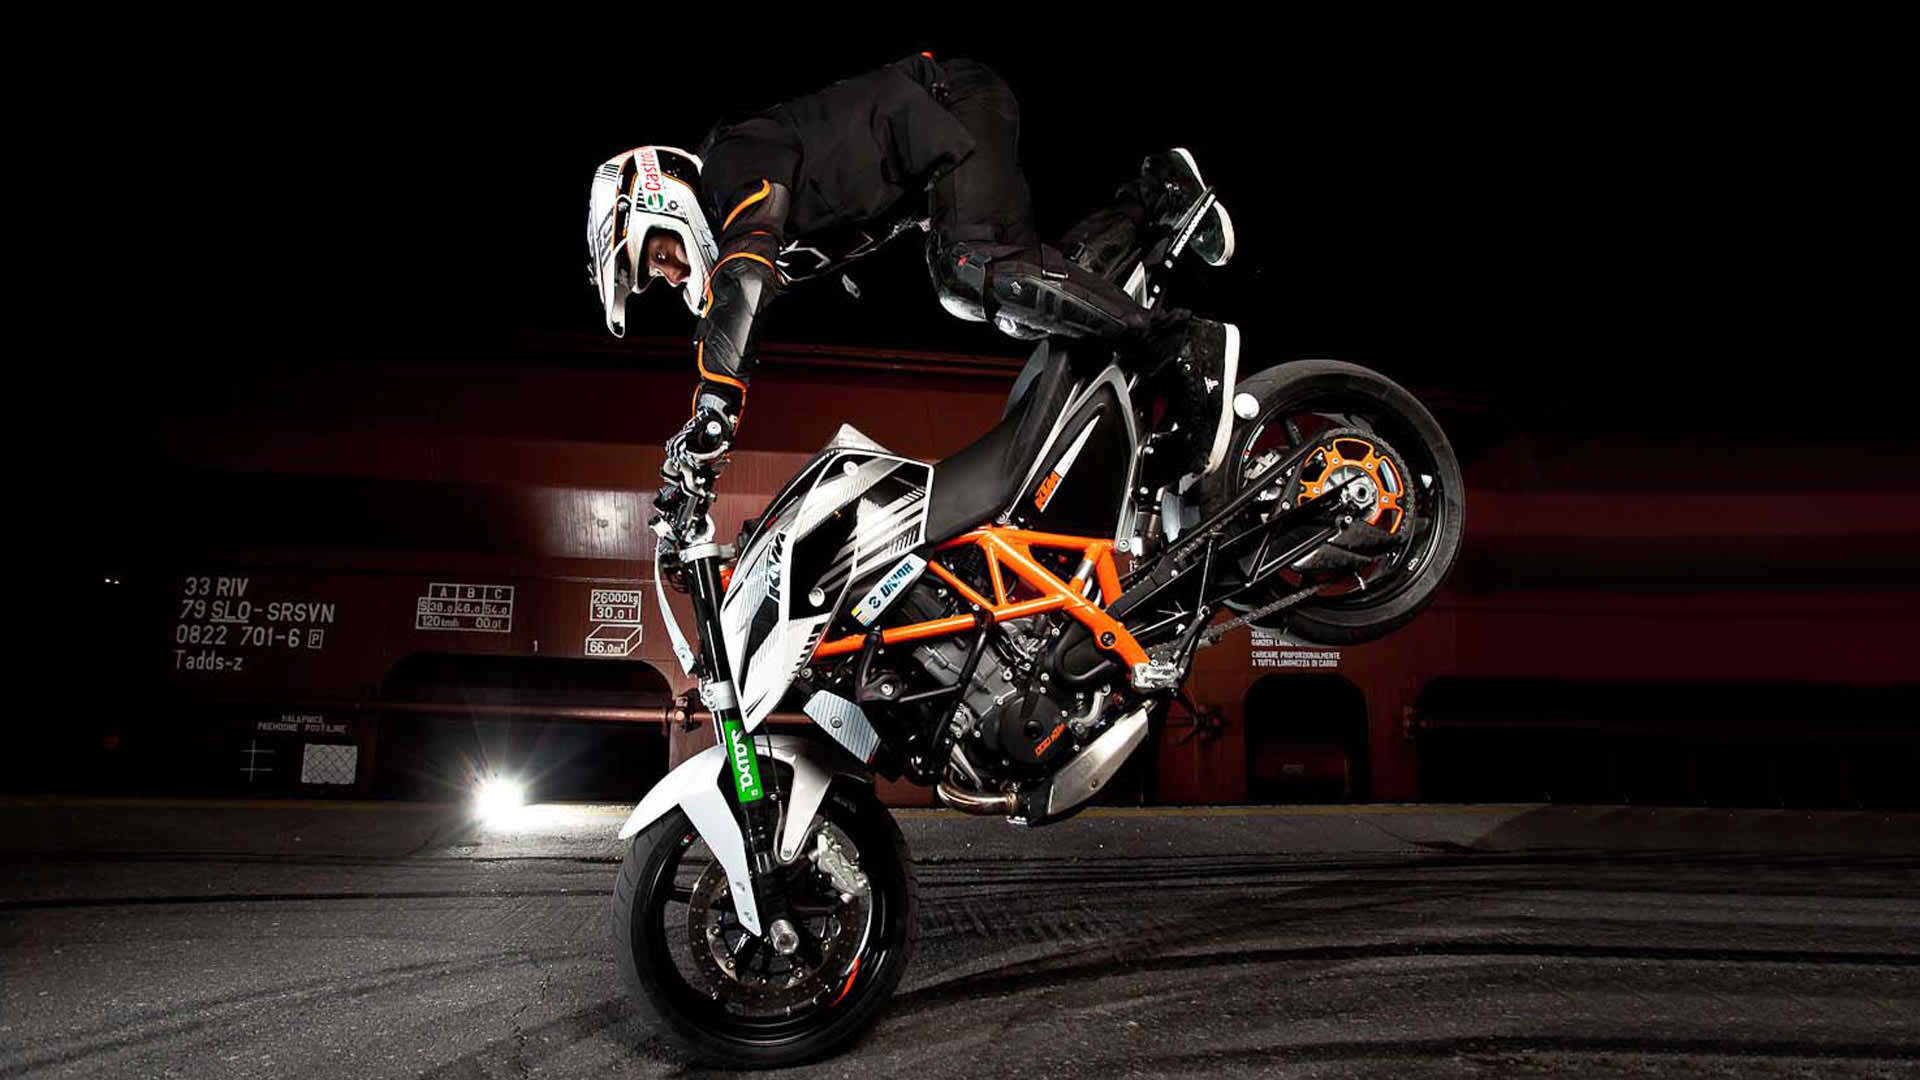 Res: 1920x1080, Bike Stunt Full HD Wallpapers.